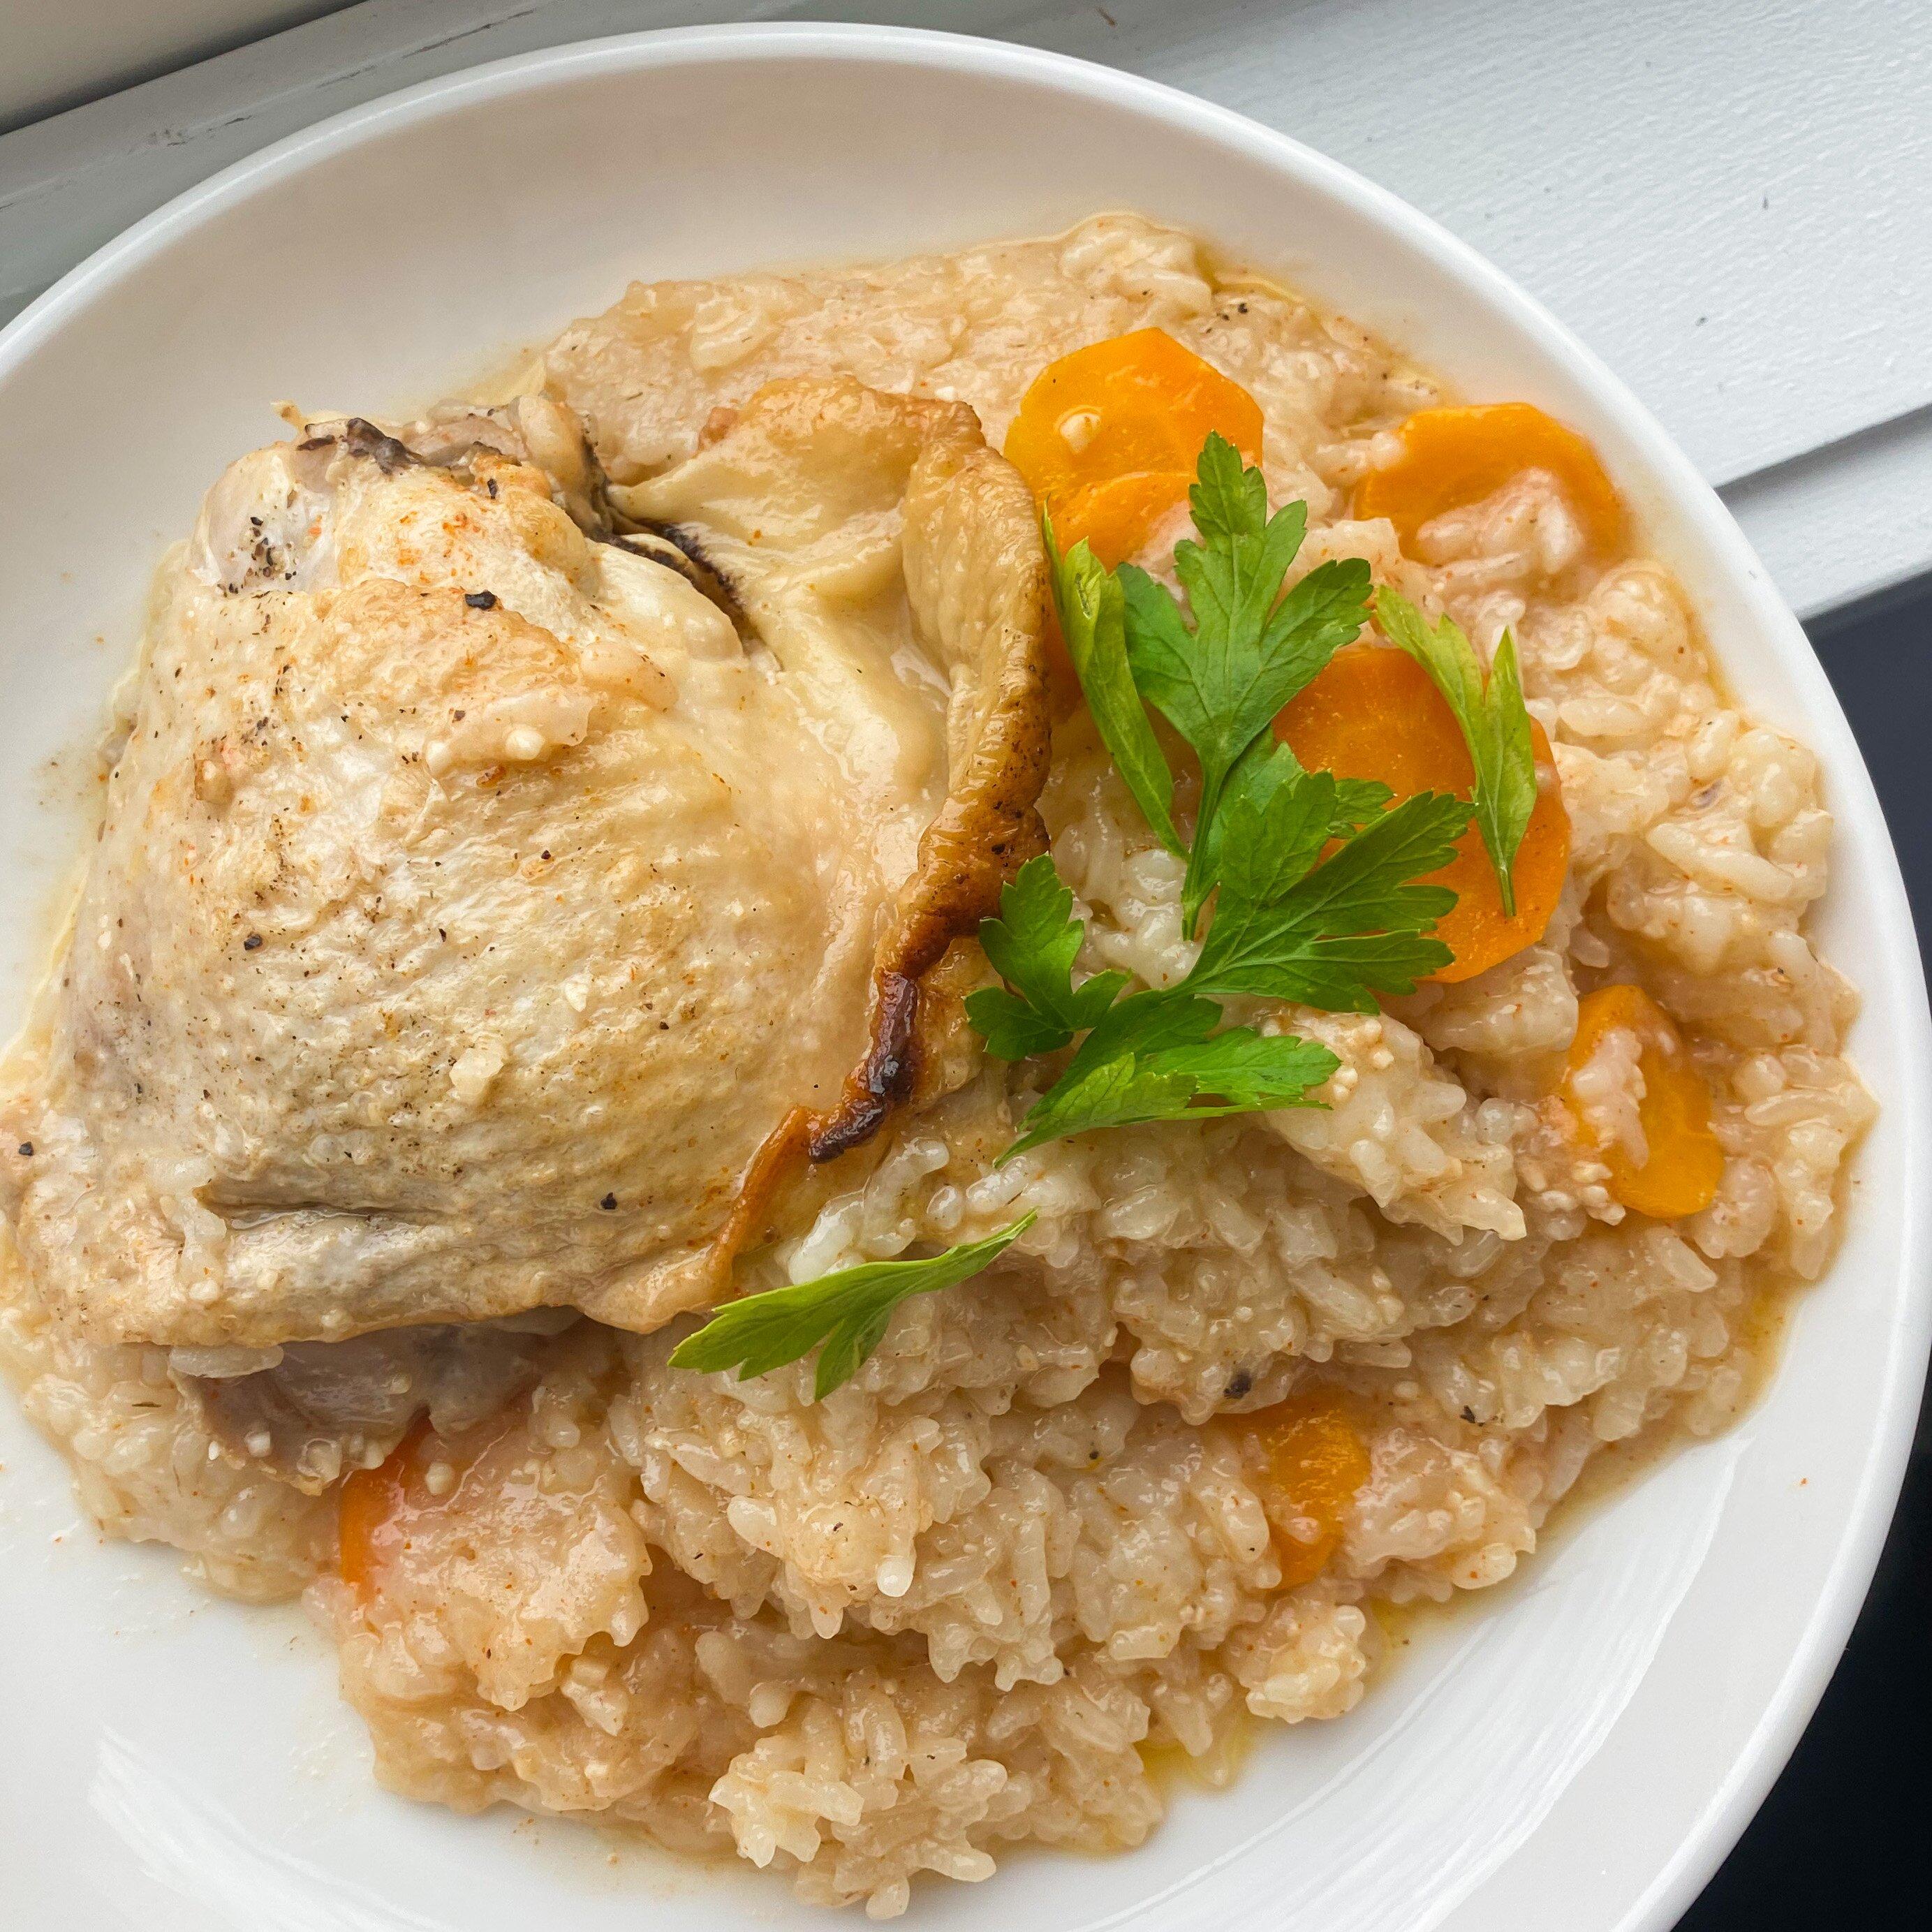 slow cooker lemon garlic chicken and rice